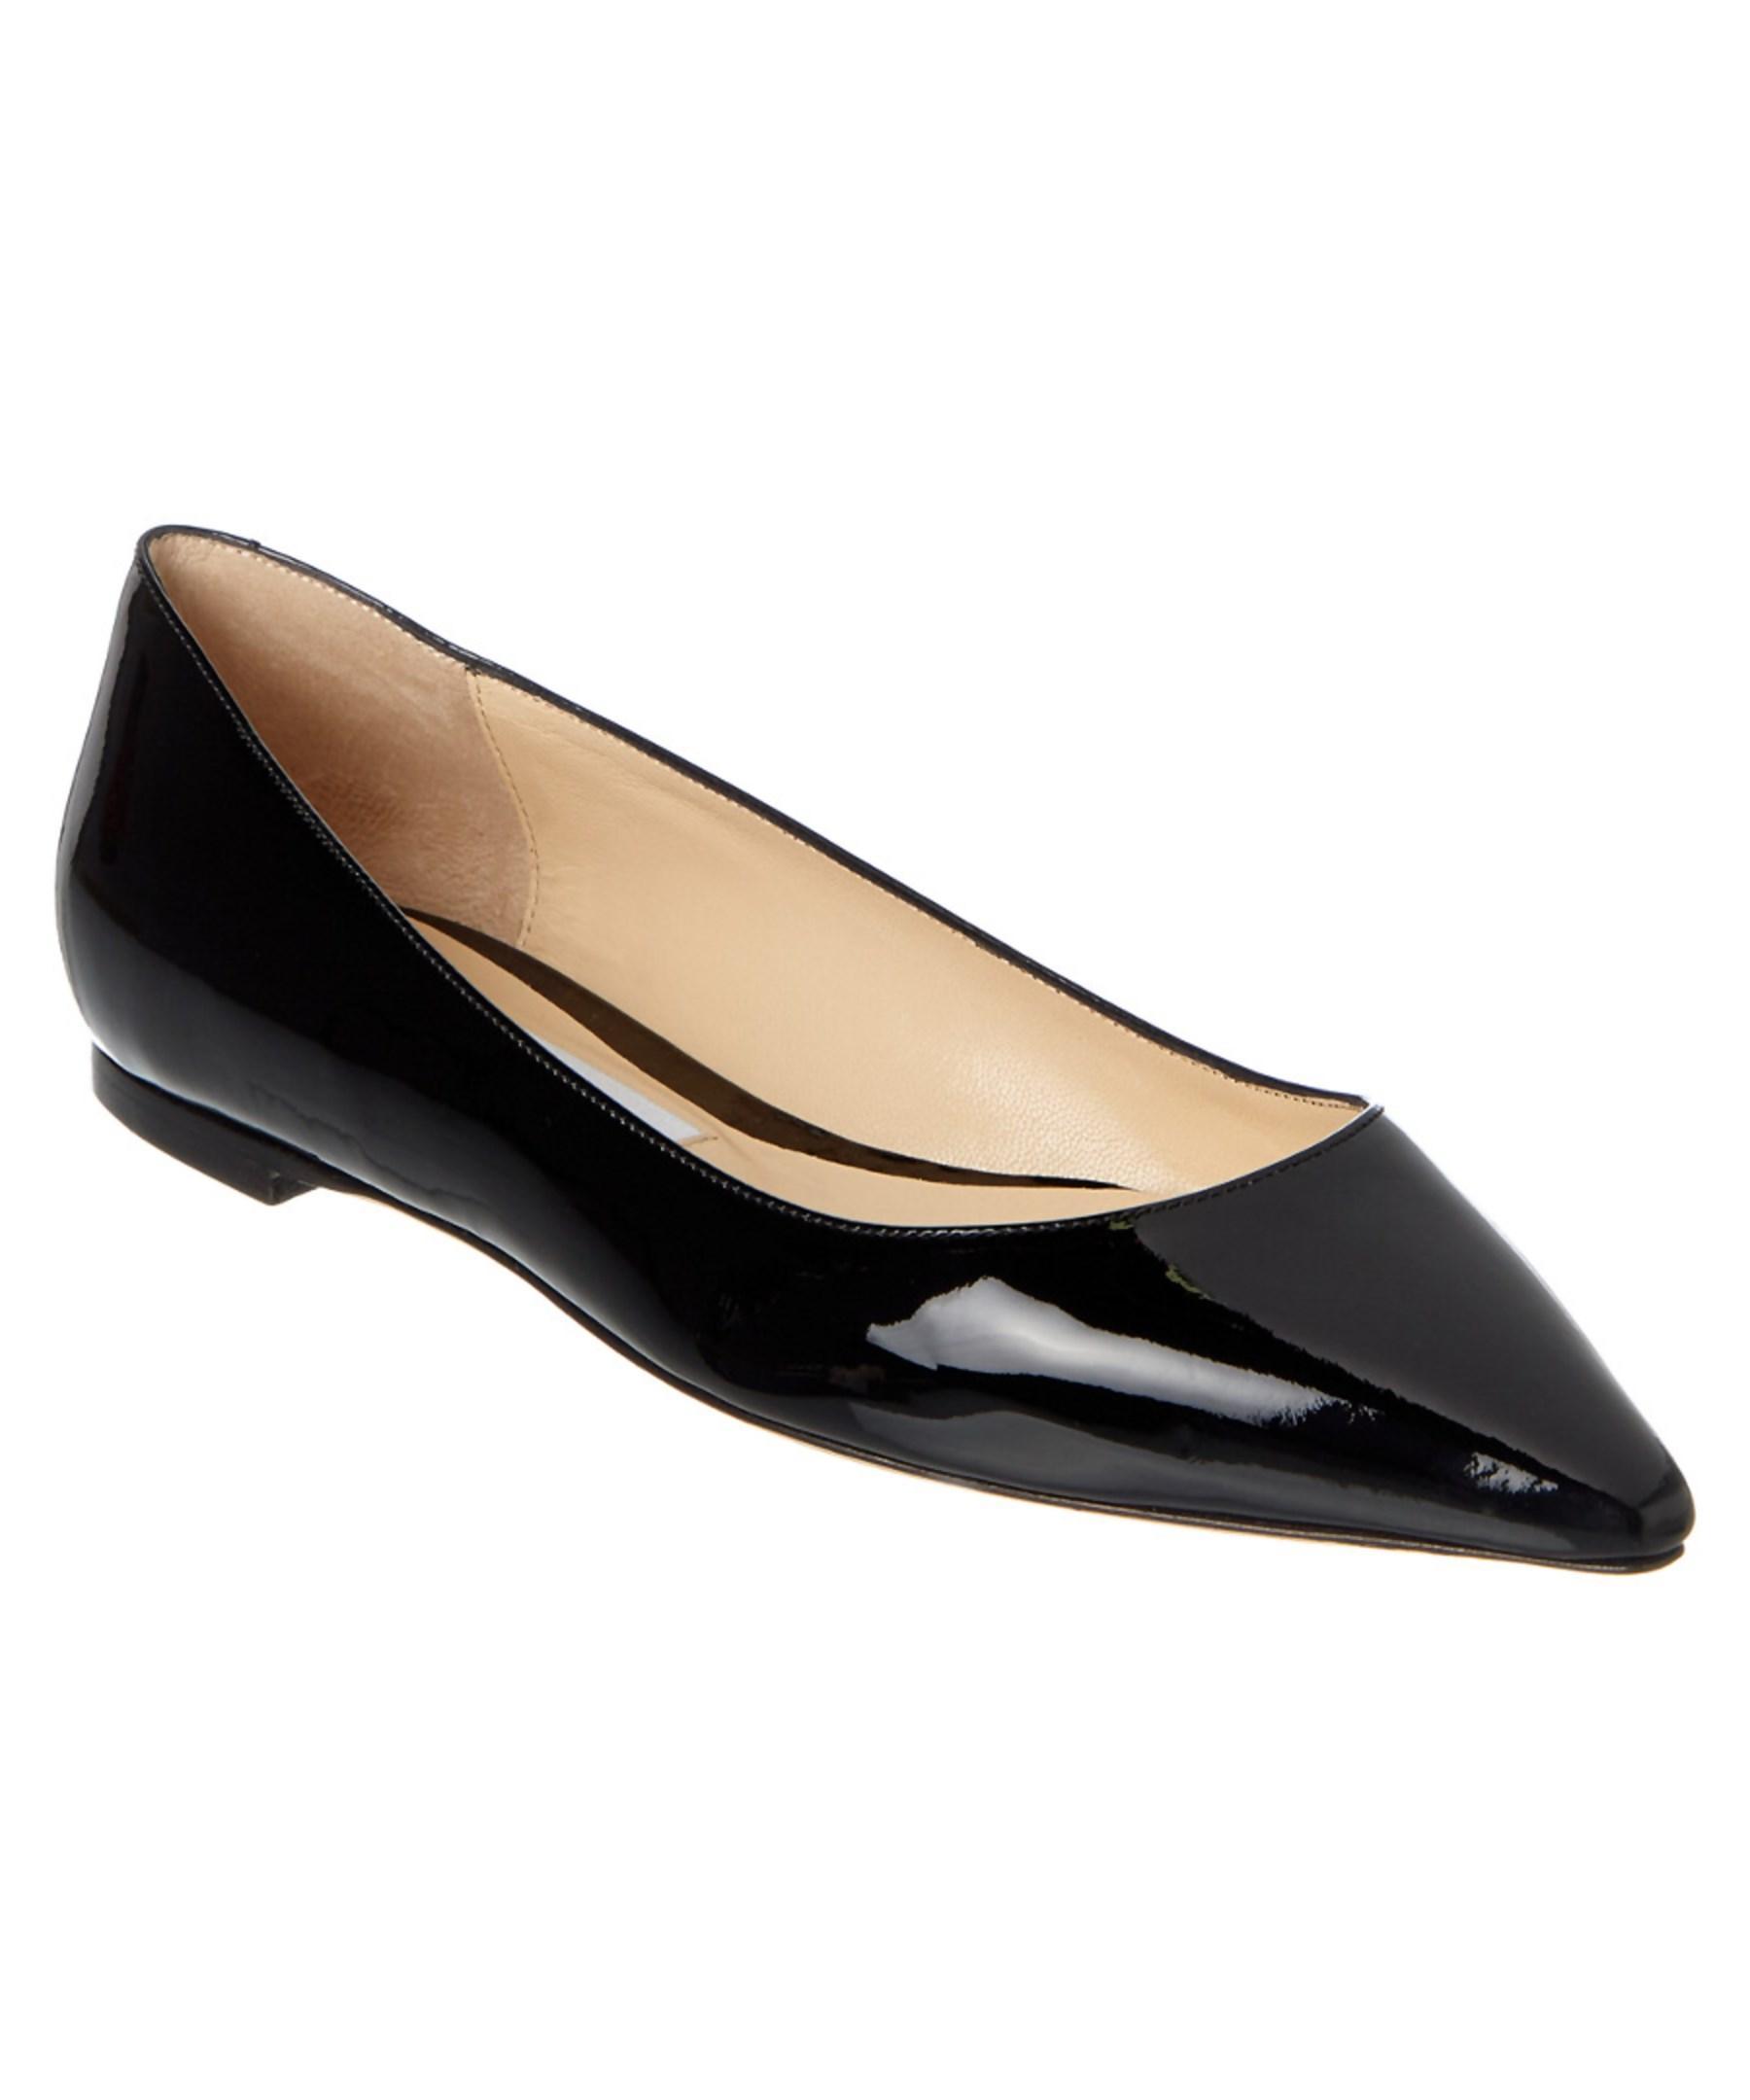 Jimmy choo Romy Patent Pointy Toe Flat in Black